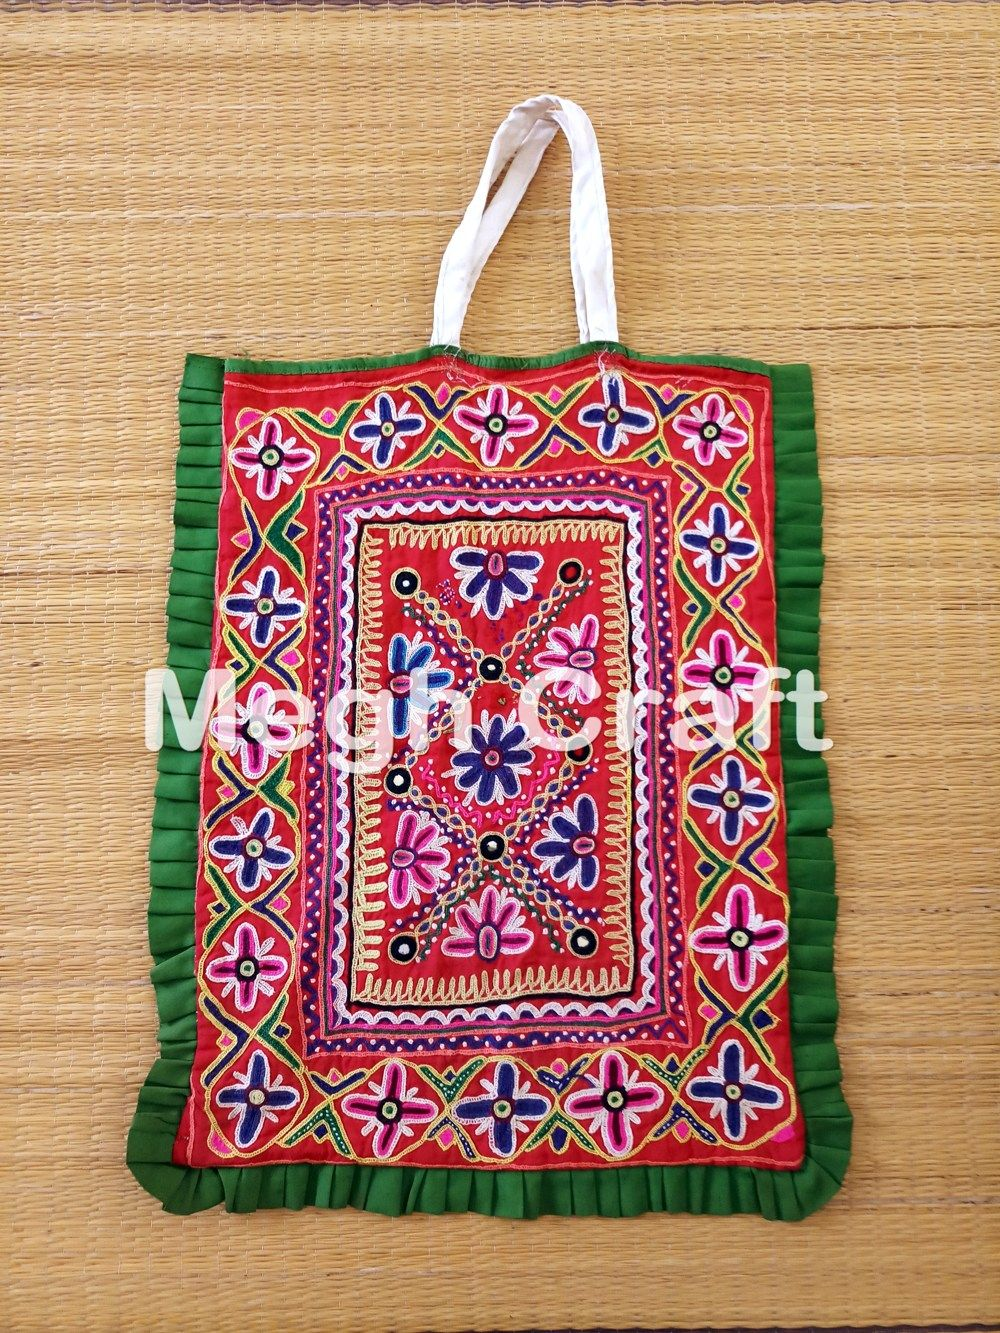 eda1d8b4c141 ... VINTAGE TRADITIONAL THELI HANDBAG by Craft   Fashion. Handmade Gypsy  Banjara Bag- Indian Banjara Handmade Bag - BY  CraftsOfGujarat   craftnfashion